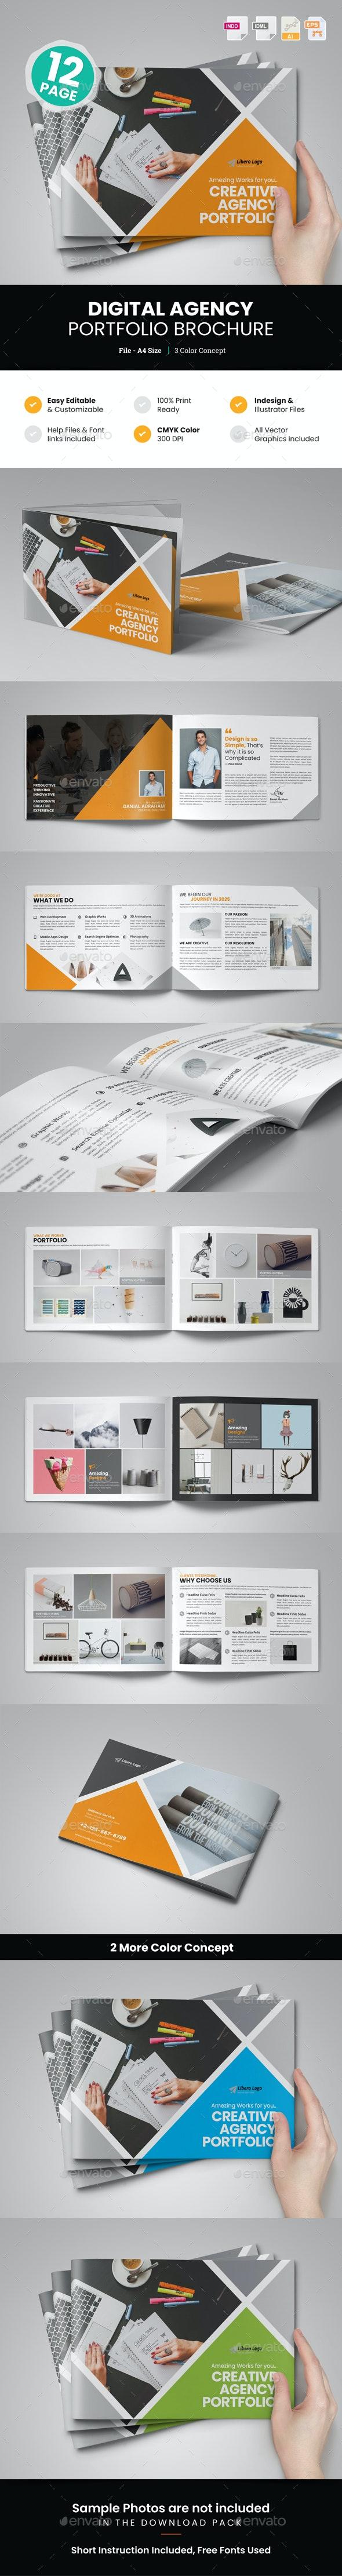 Digital Agency Portfolio Brochure v2 - Corporate Brochures